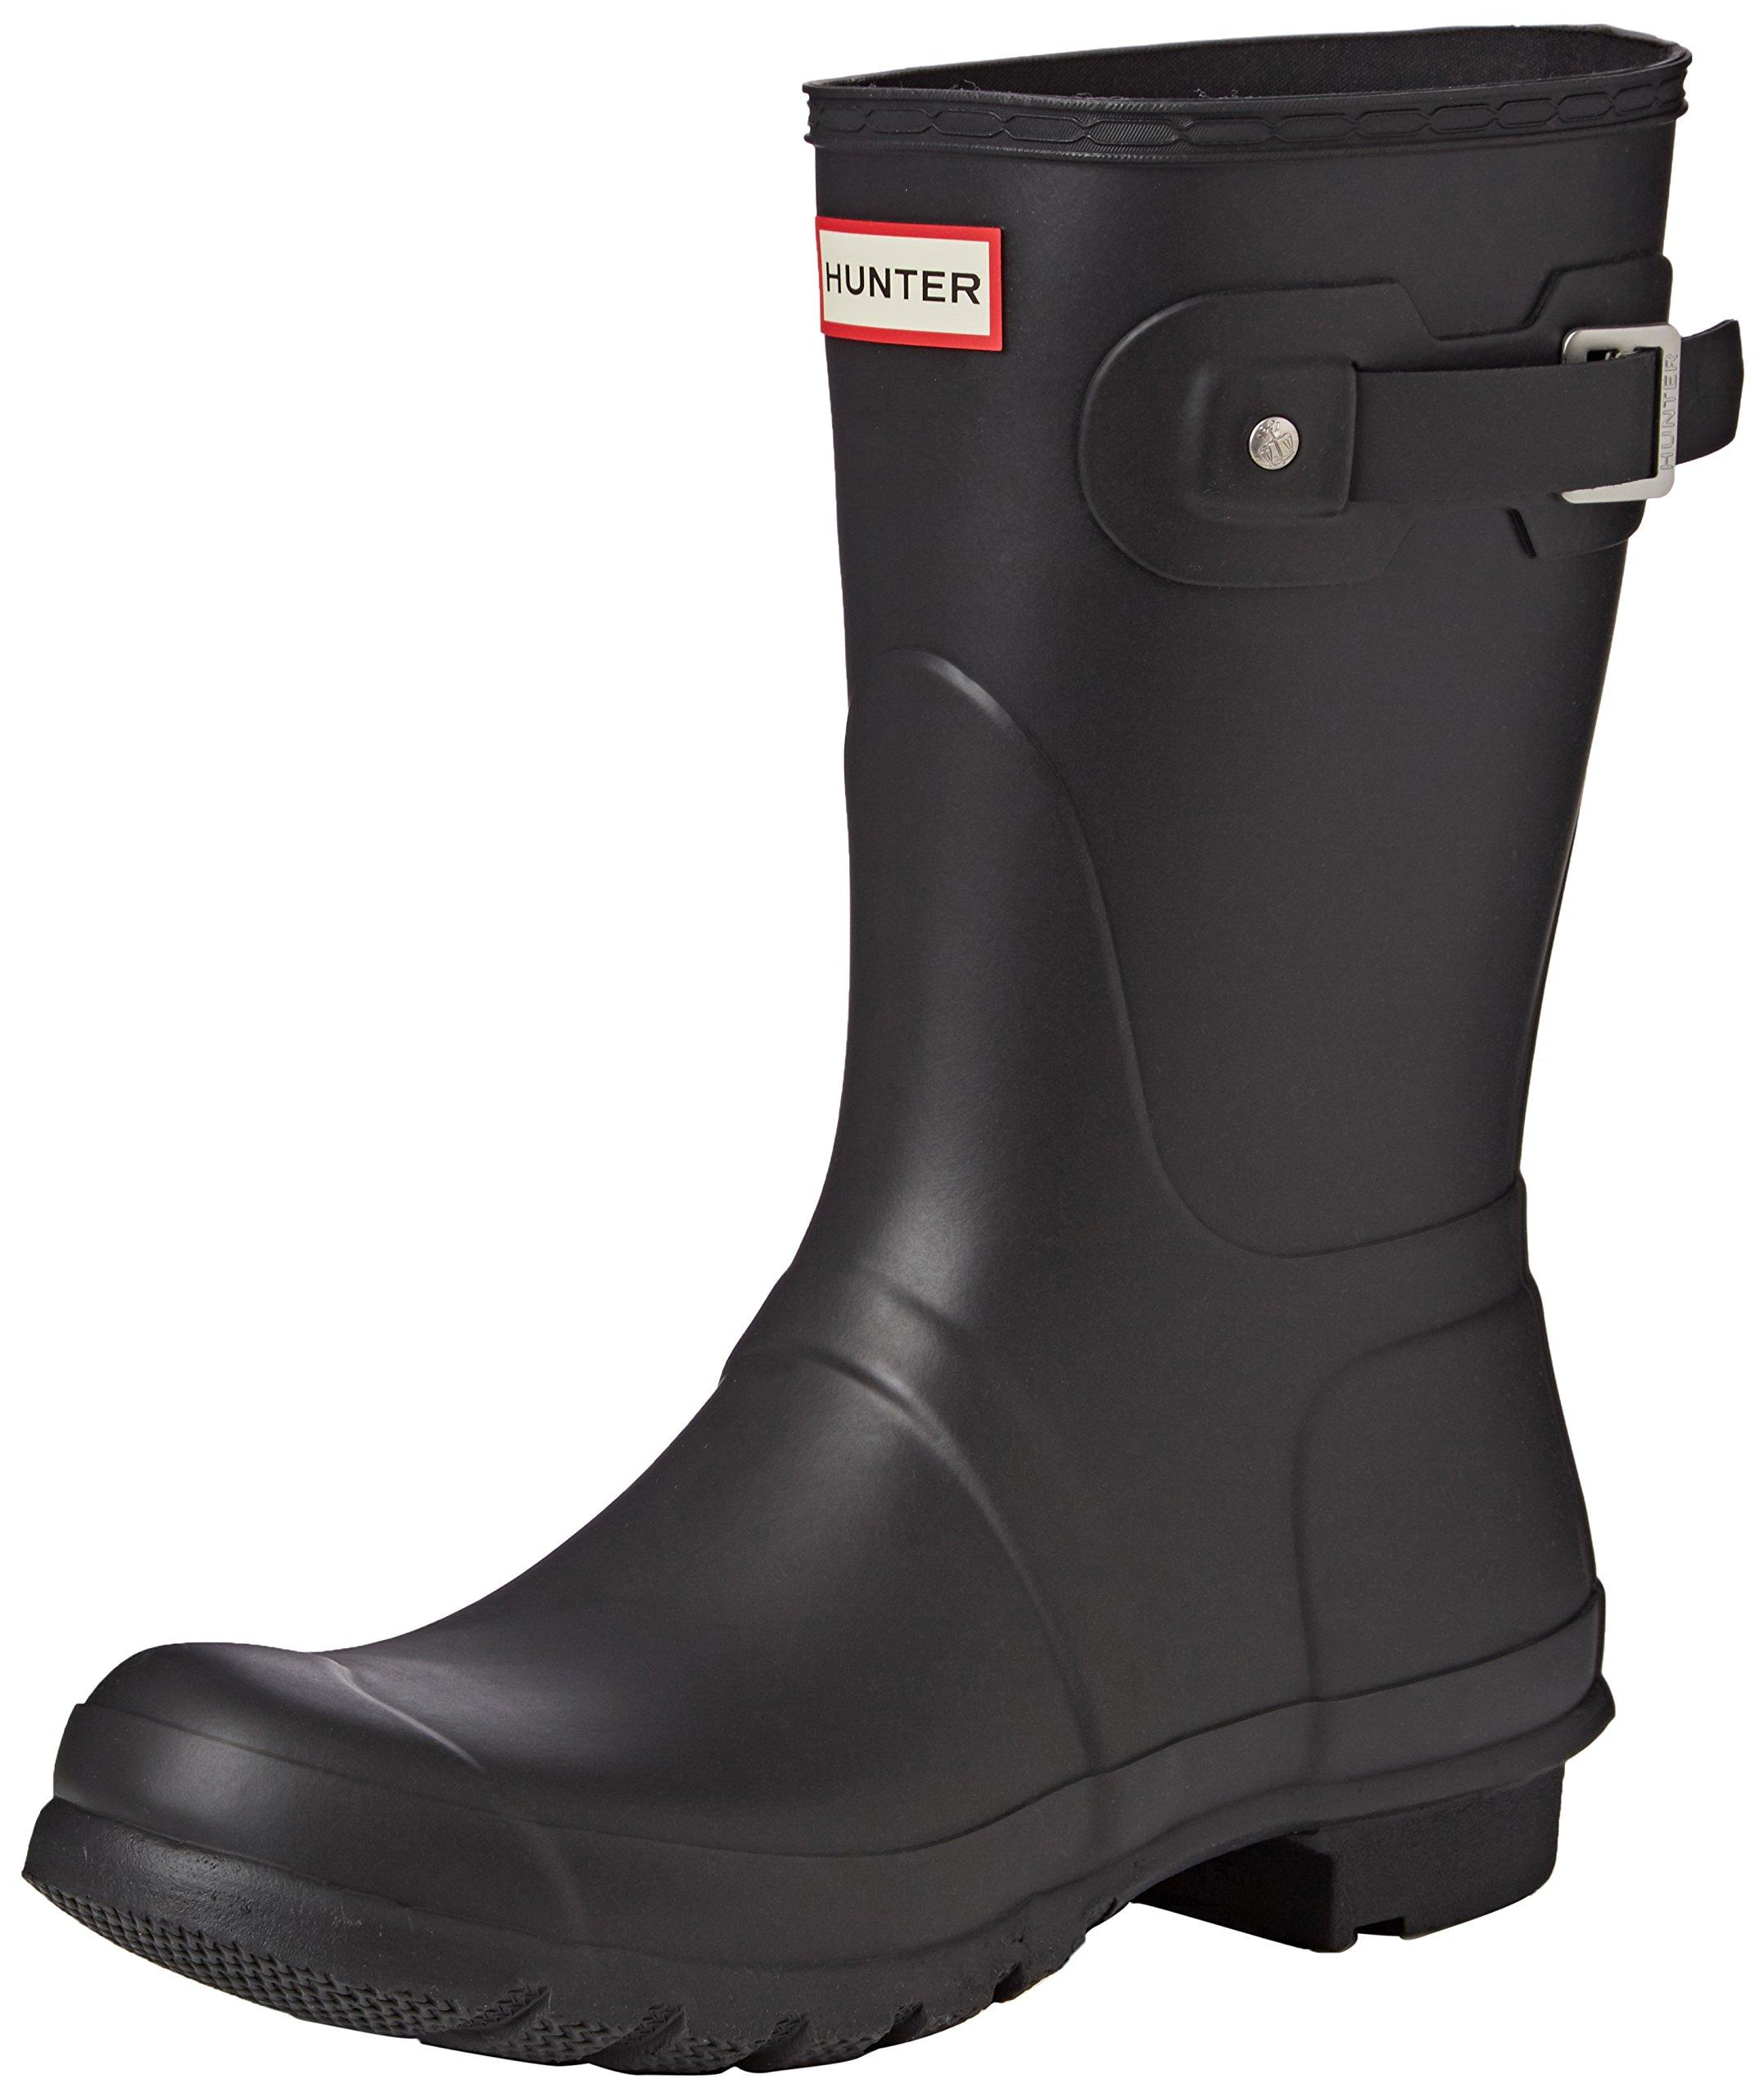 Hunter Womens Original Short Black Matte Rain Boot - 8 B(M) US